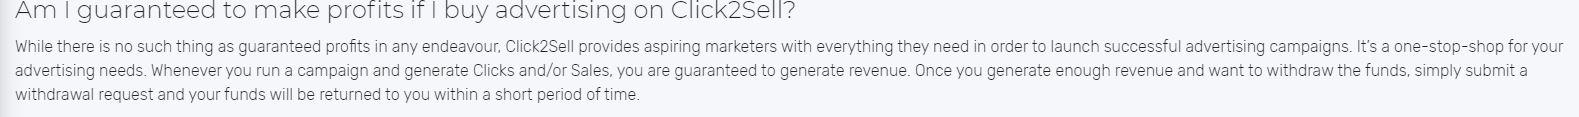 Affiliate Marketing Click2Sell Profit Guarantee